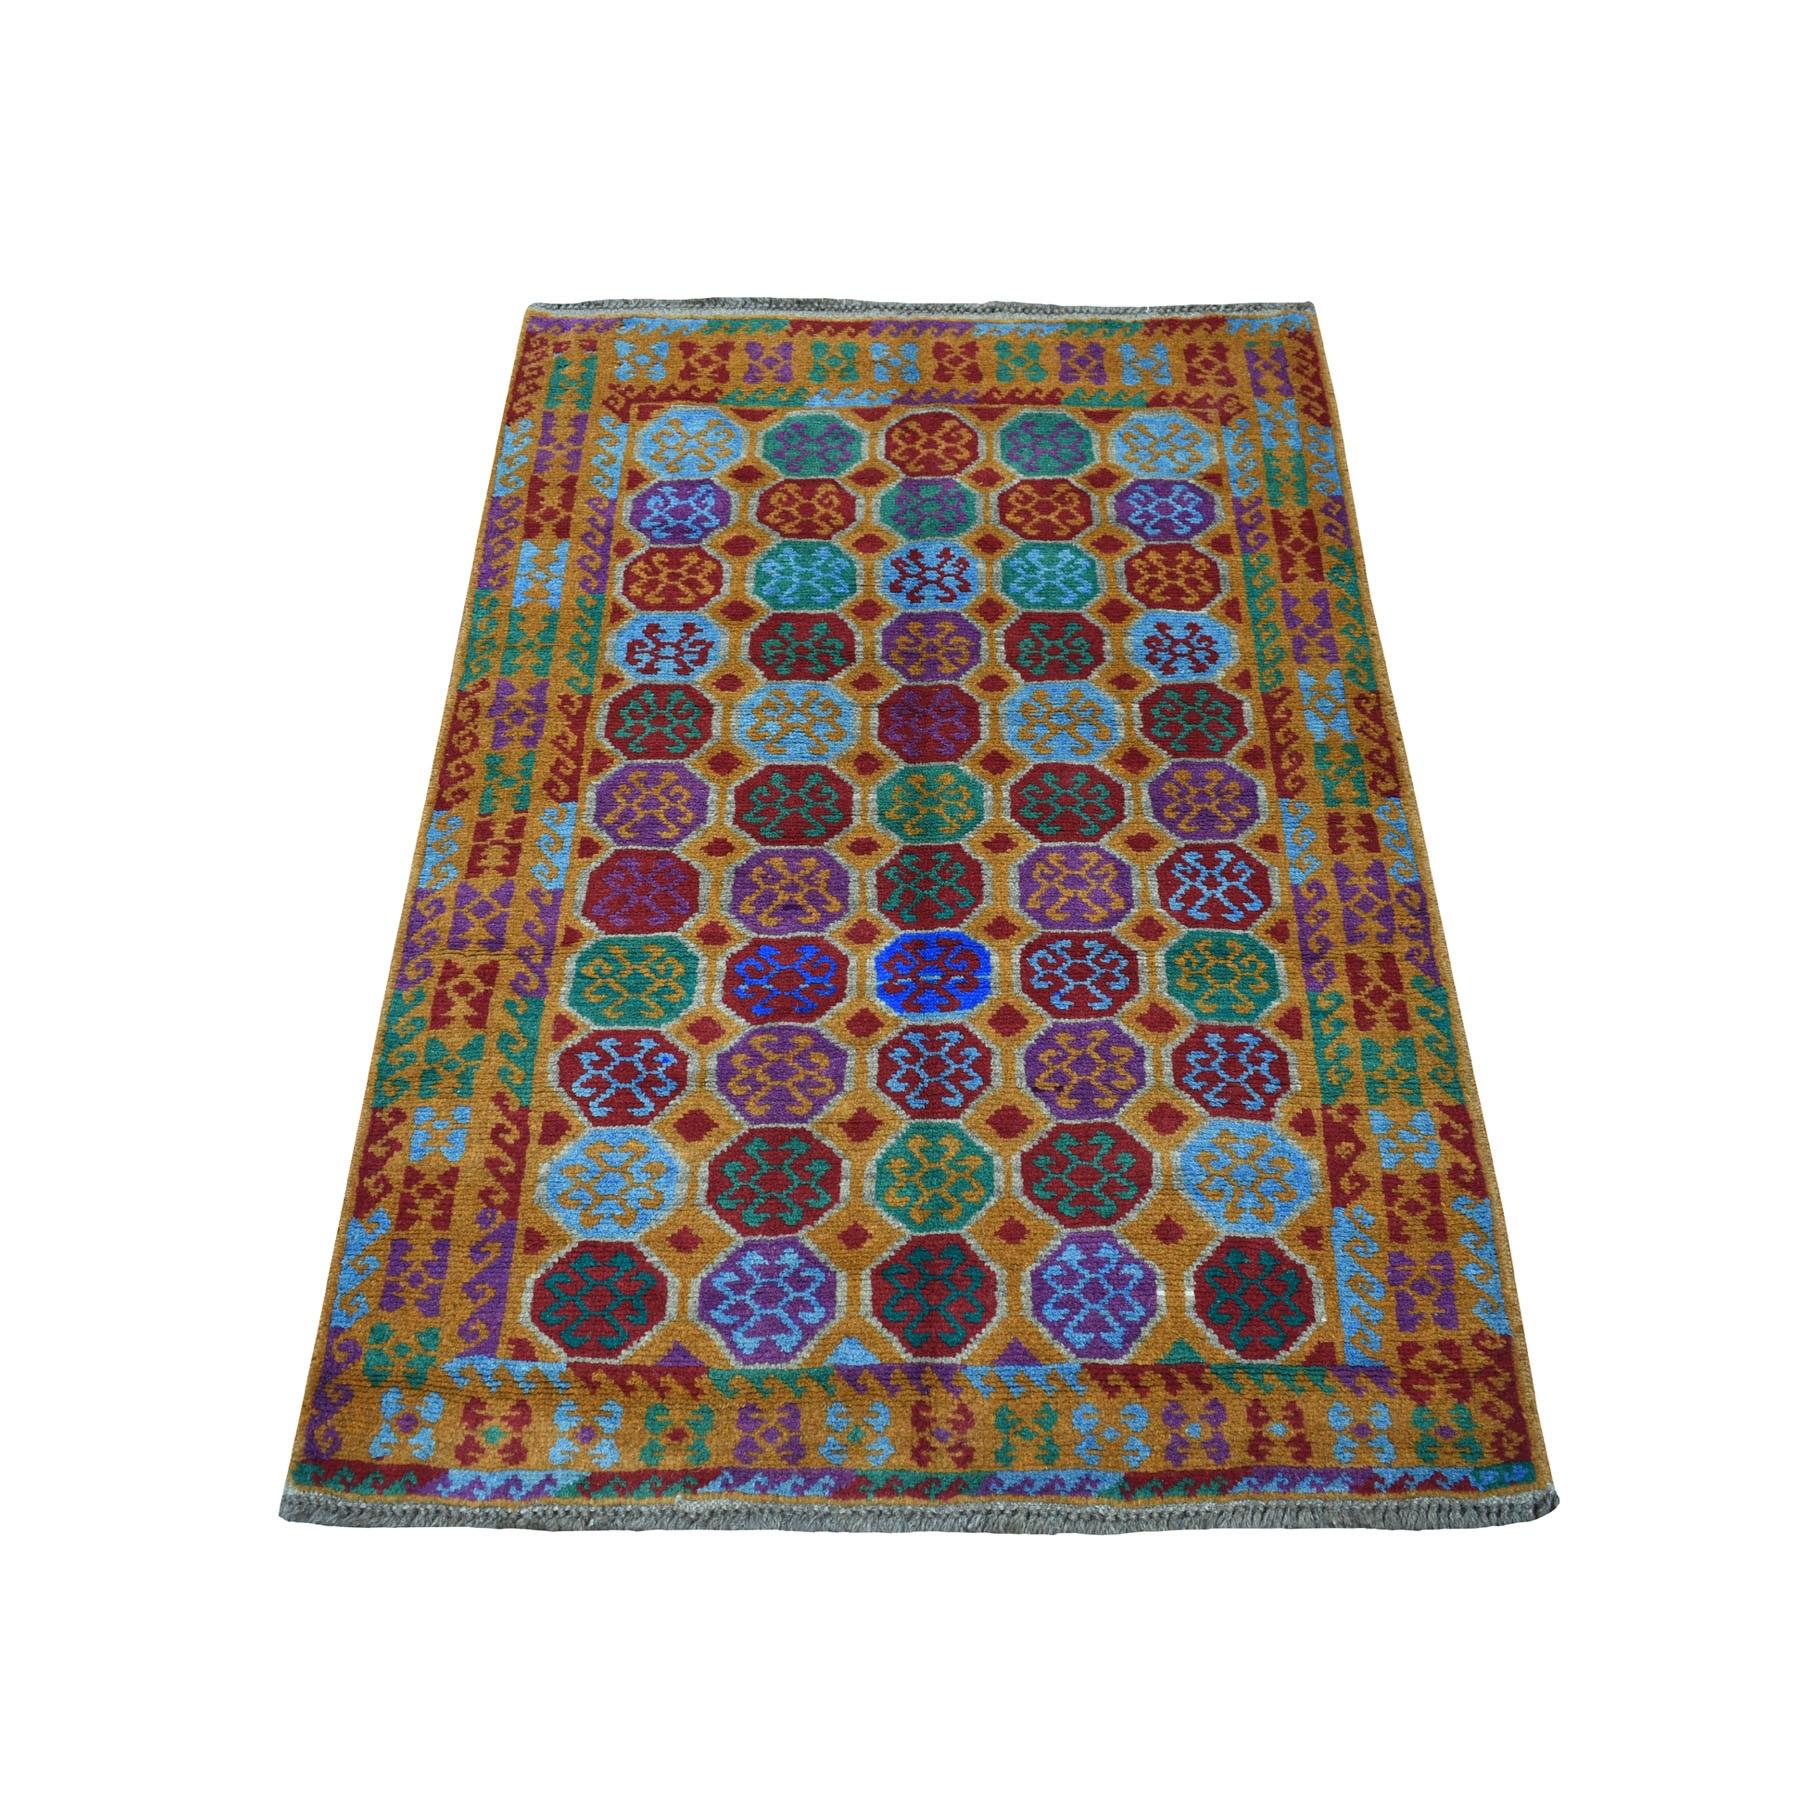 "3'5""X4'7"" Orange Elephant Feet Design Colorful Afghan Baluch Hand Knotted Pure Wool Oriental Rug moaecb7b"